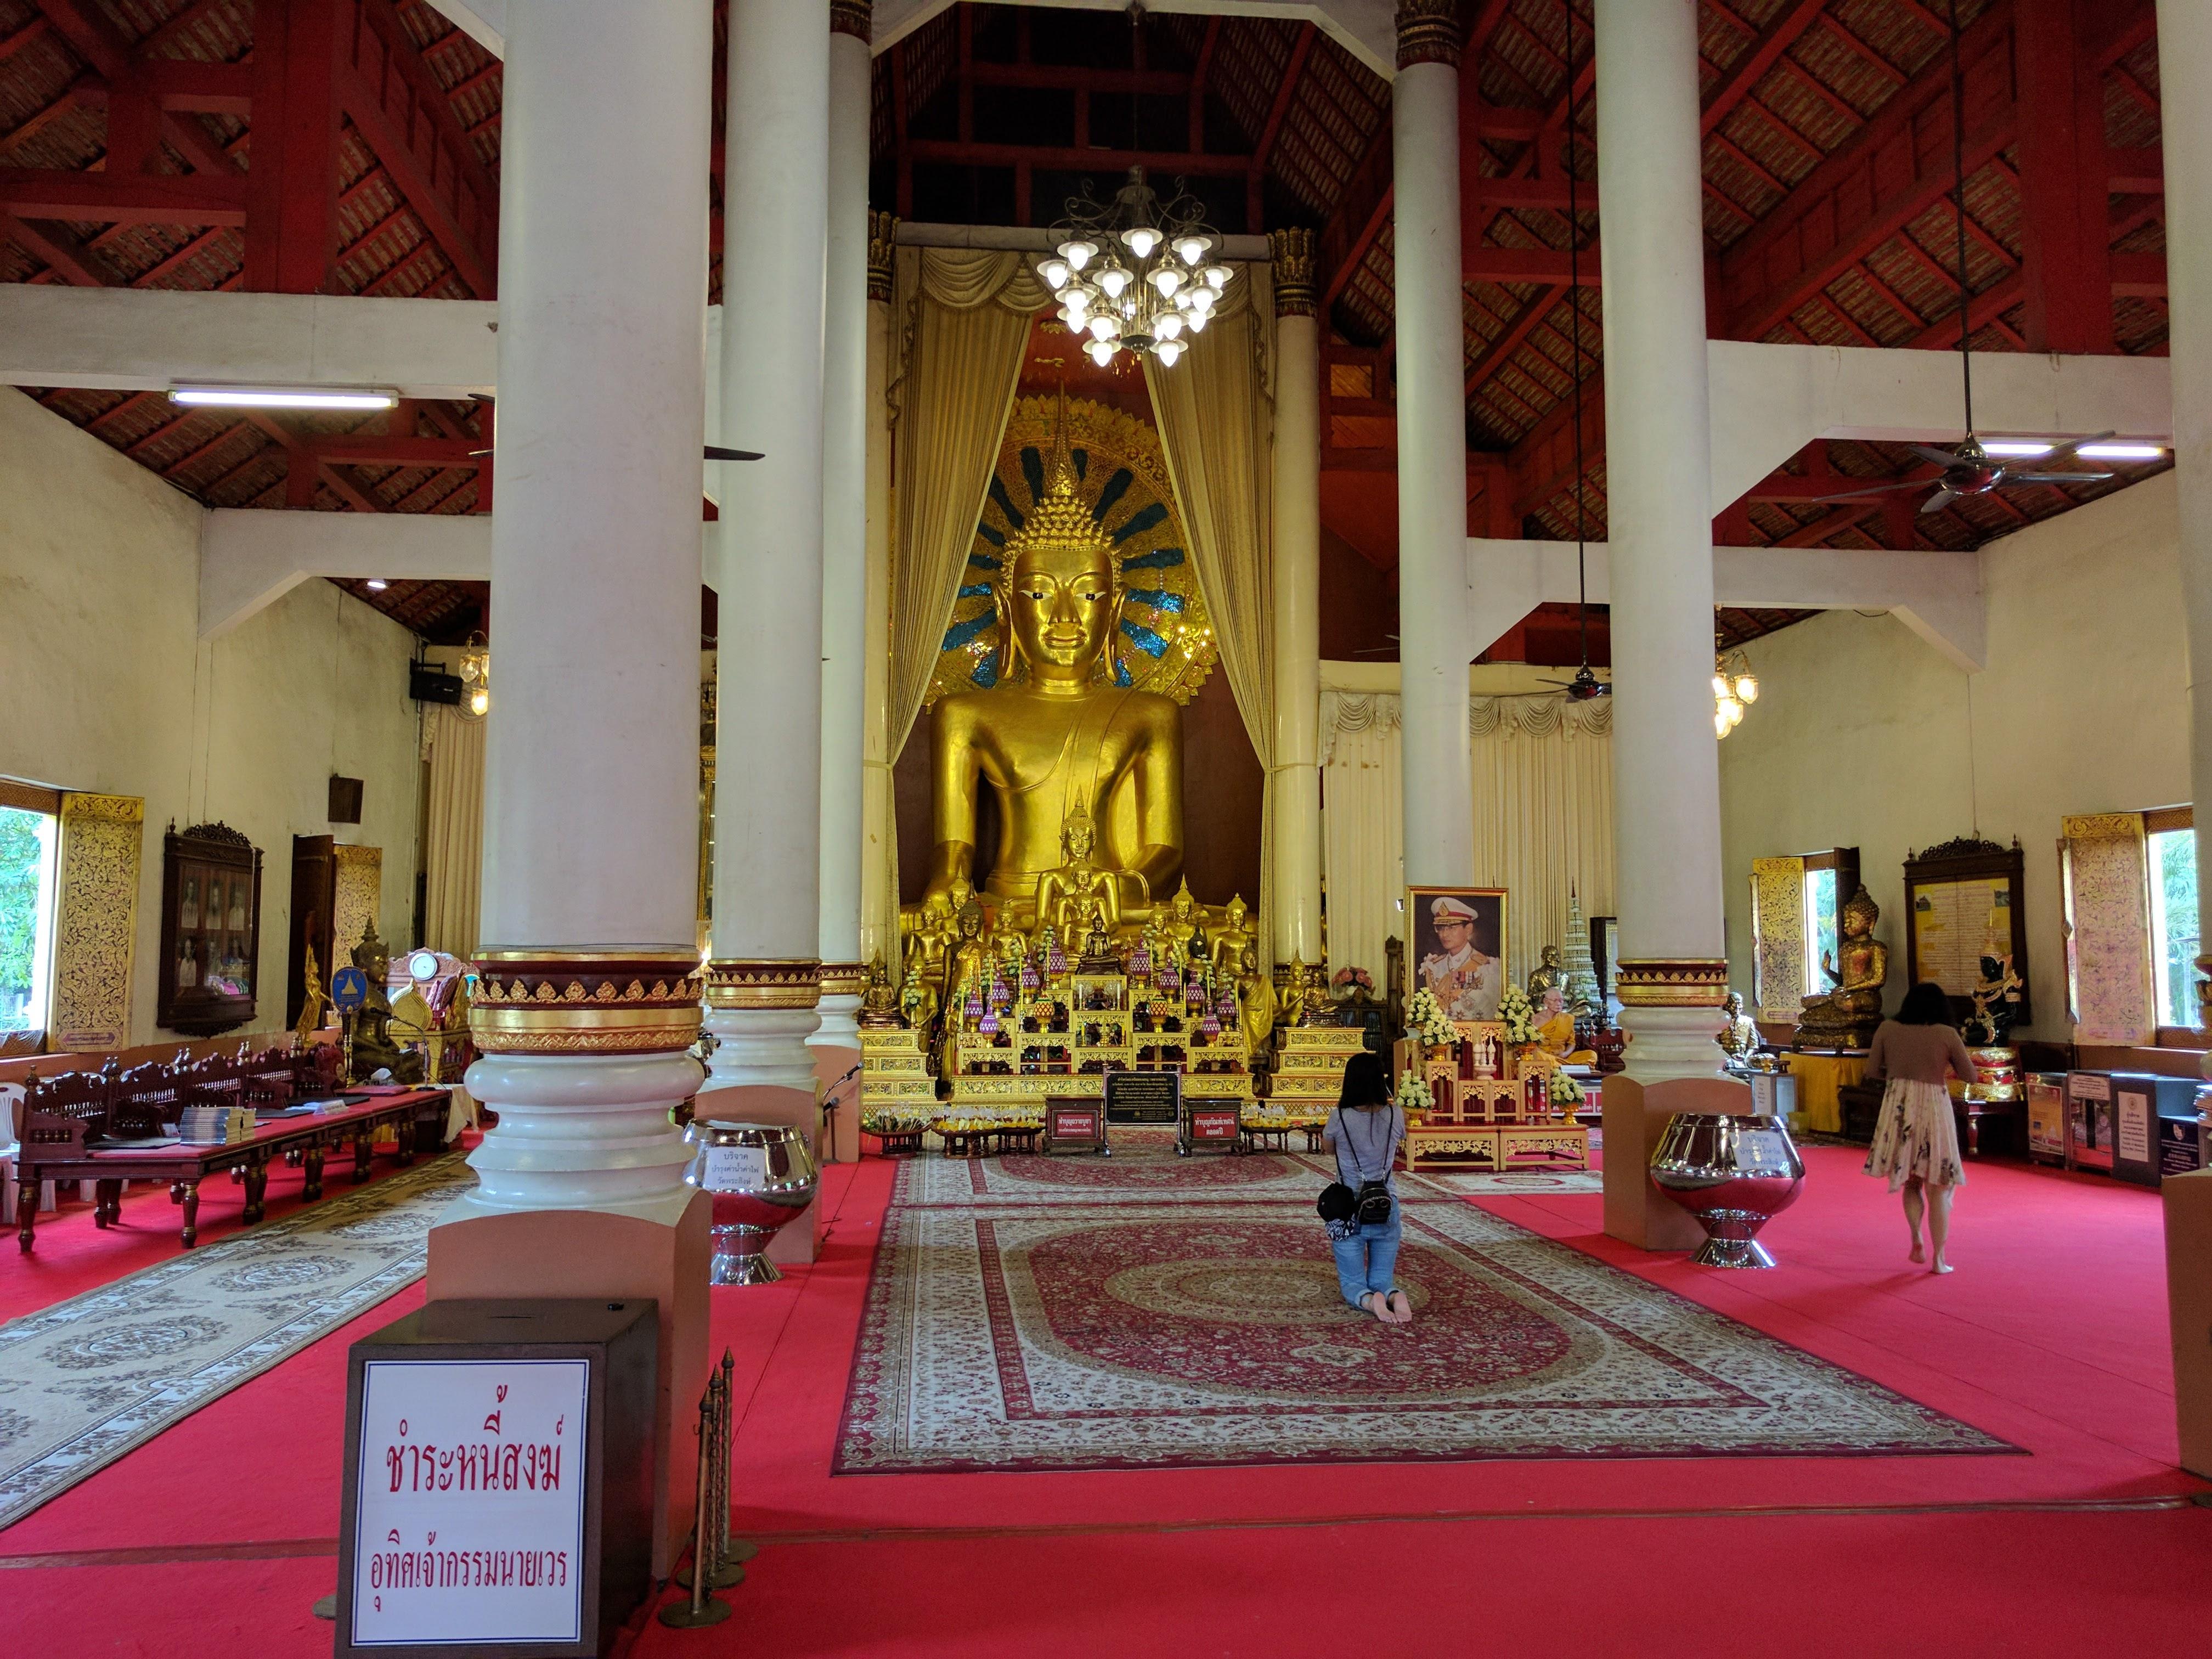 Chiang Mai temple bouddha moine